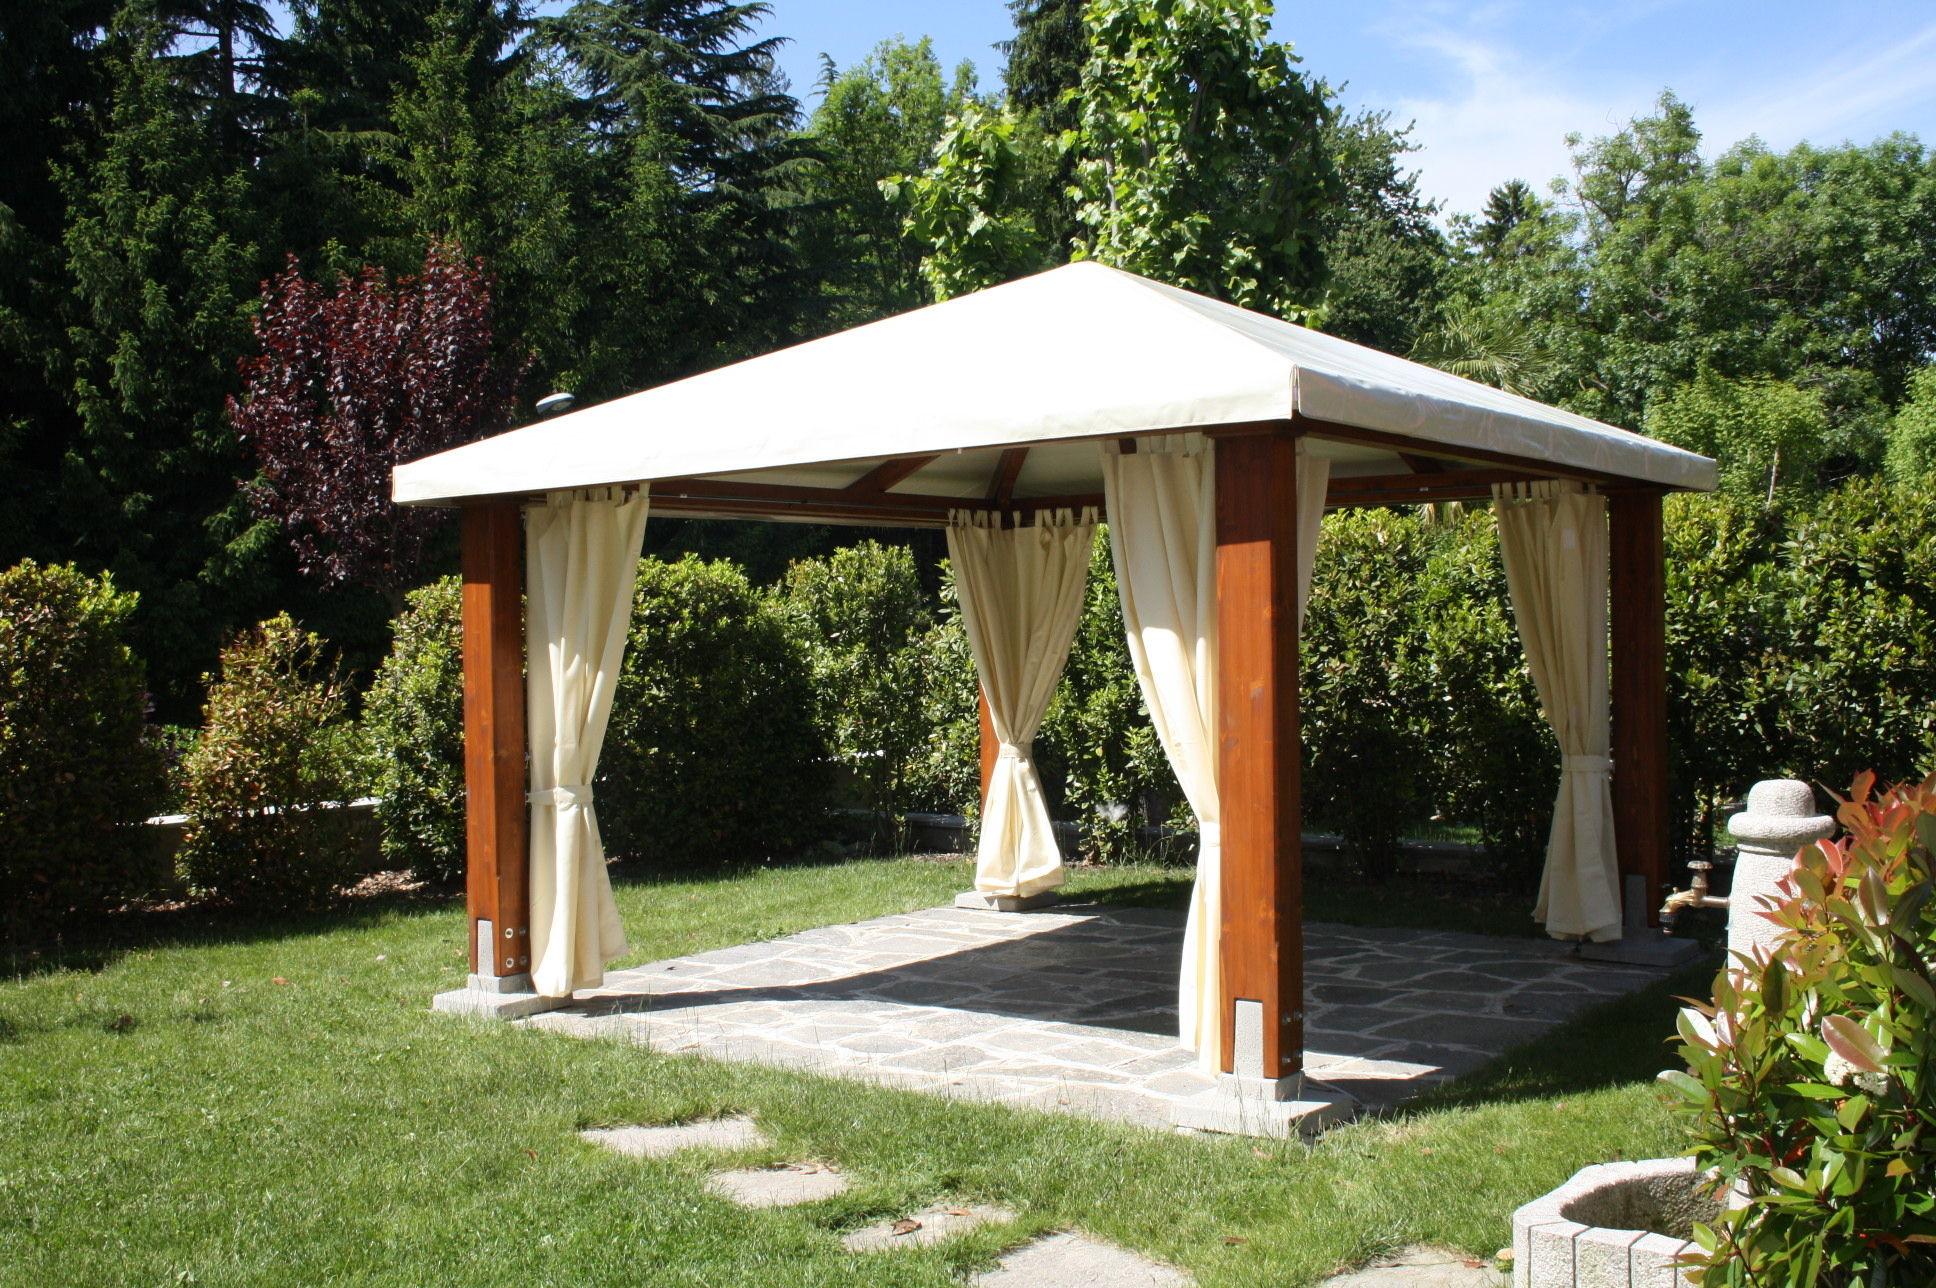 cenador de madera de techo de lona classic - Cenador De Madera